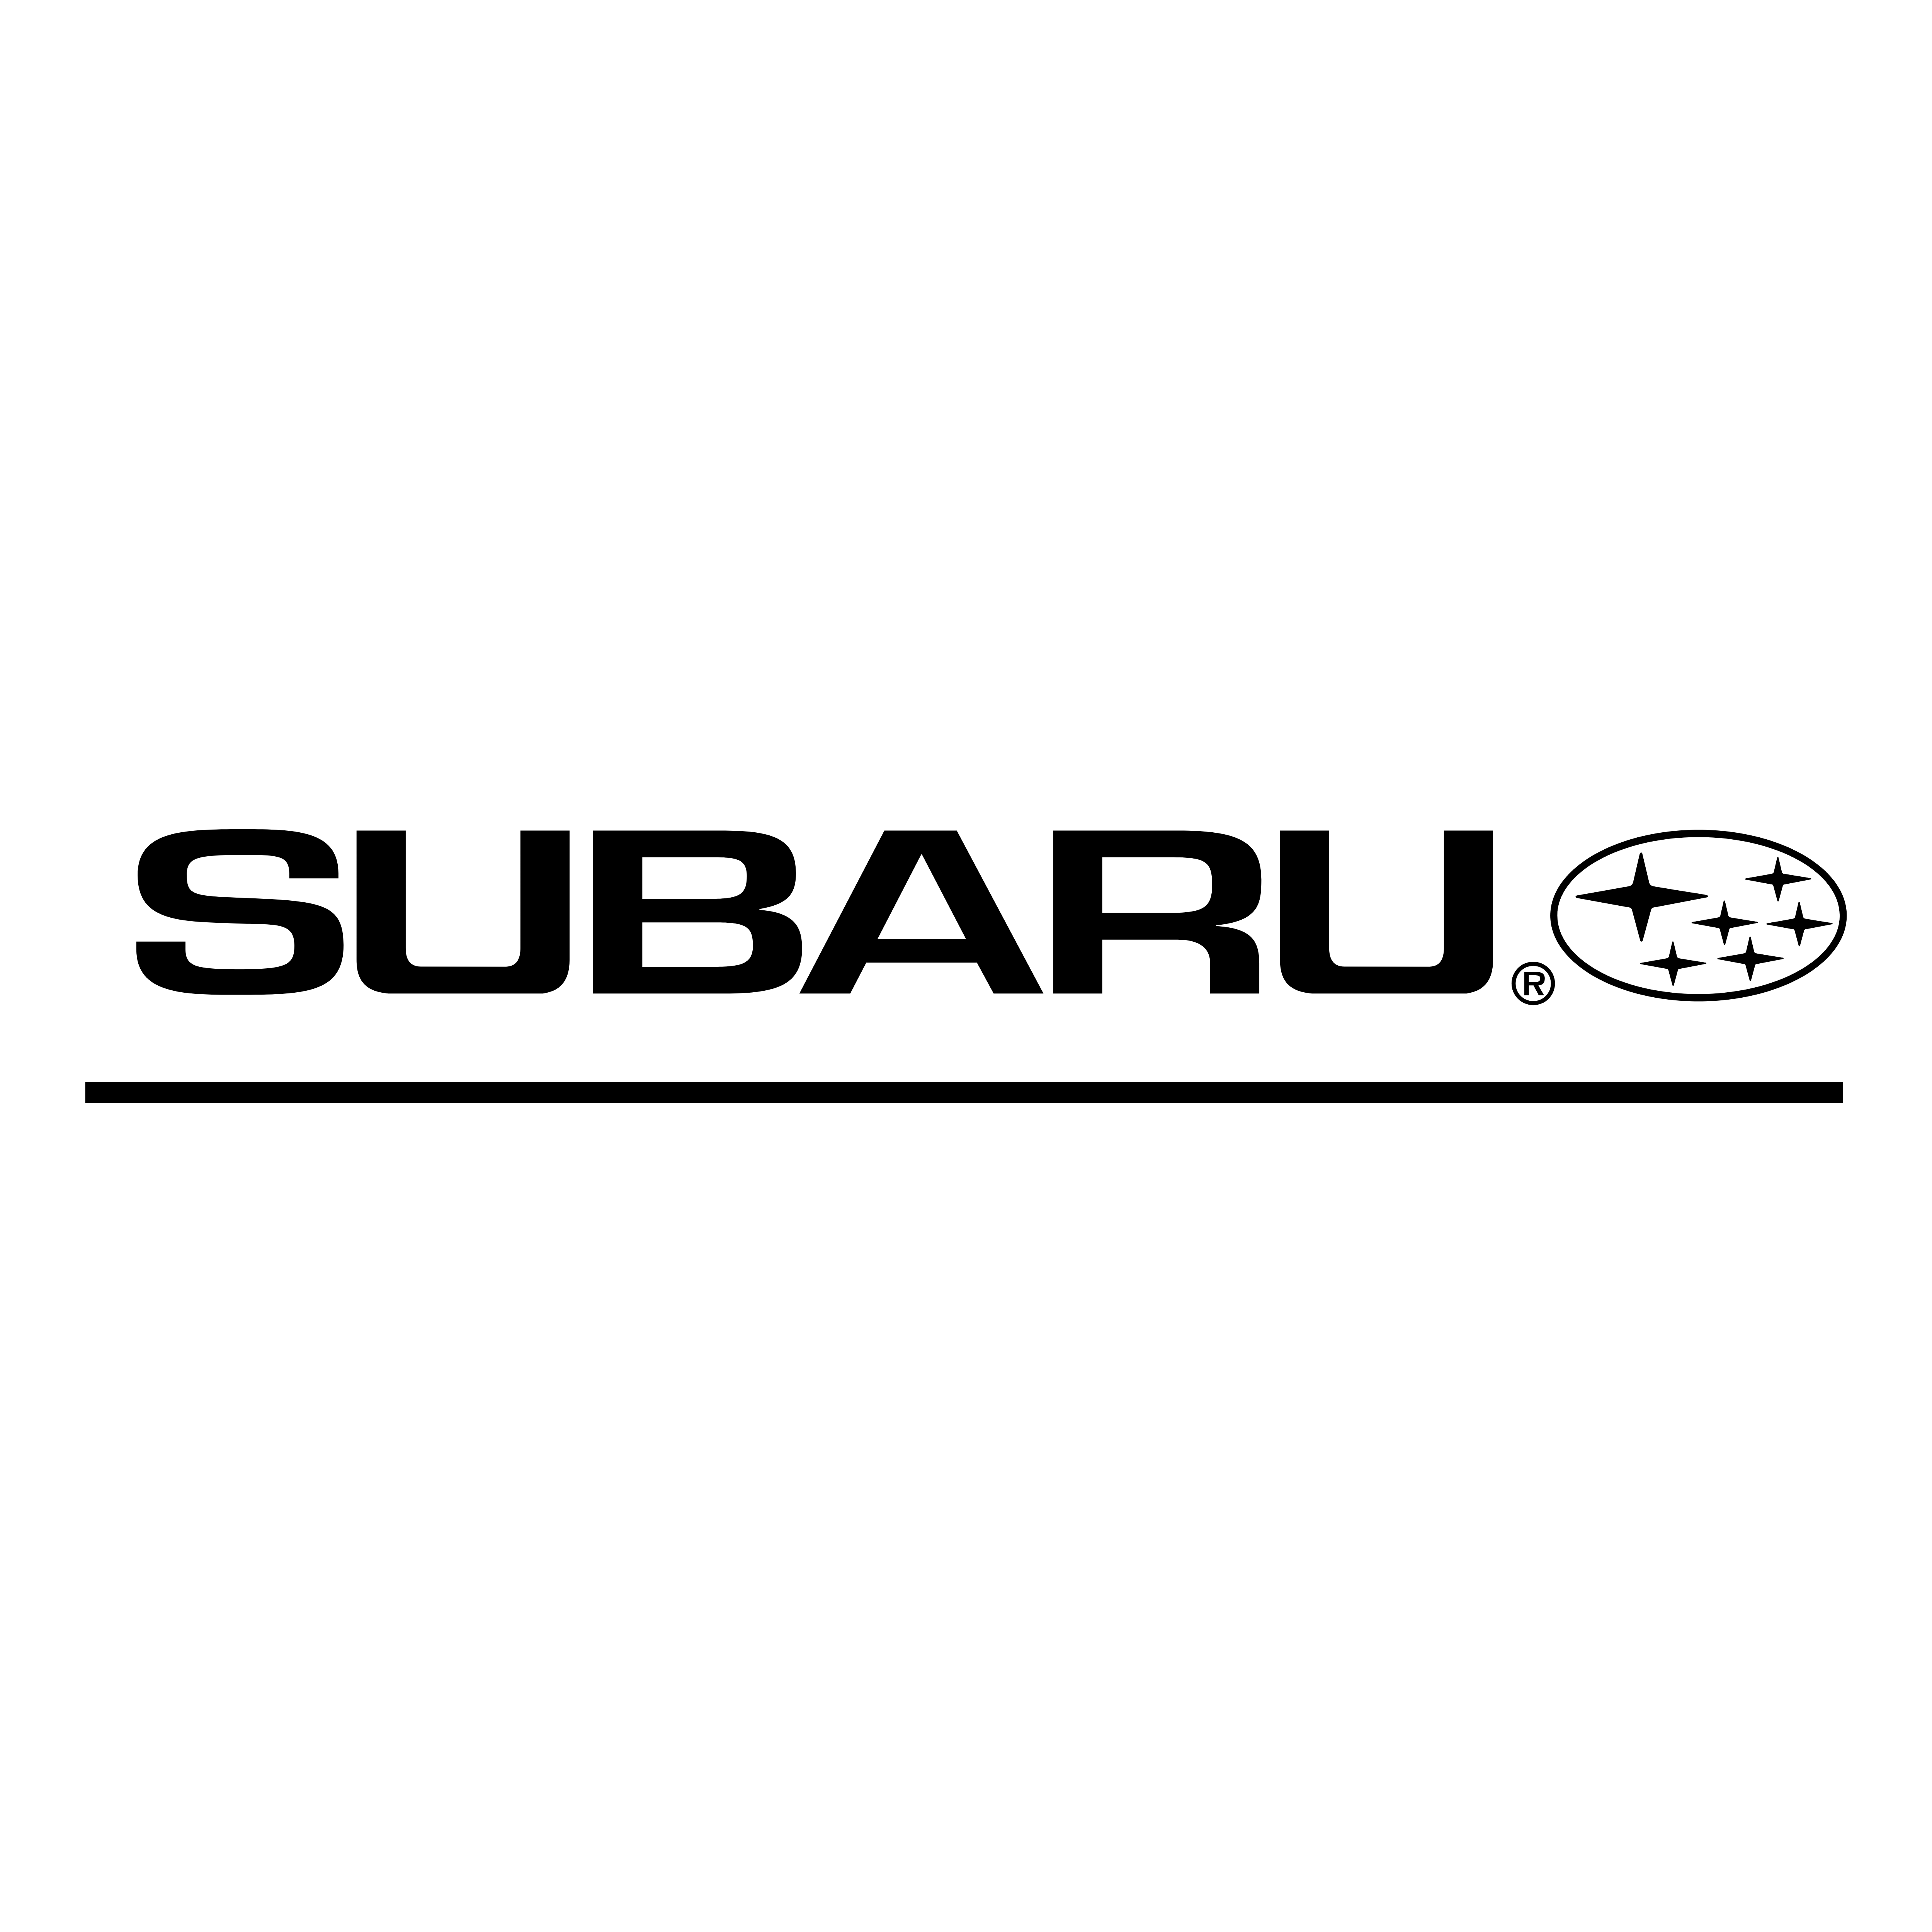 subaru � logos download